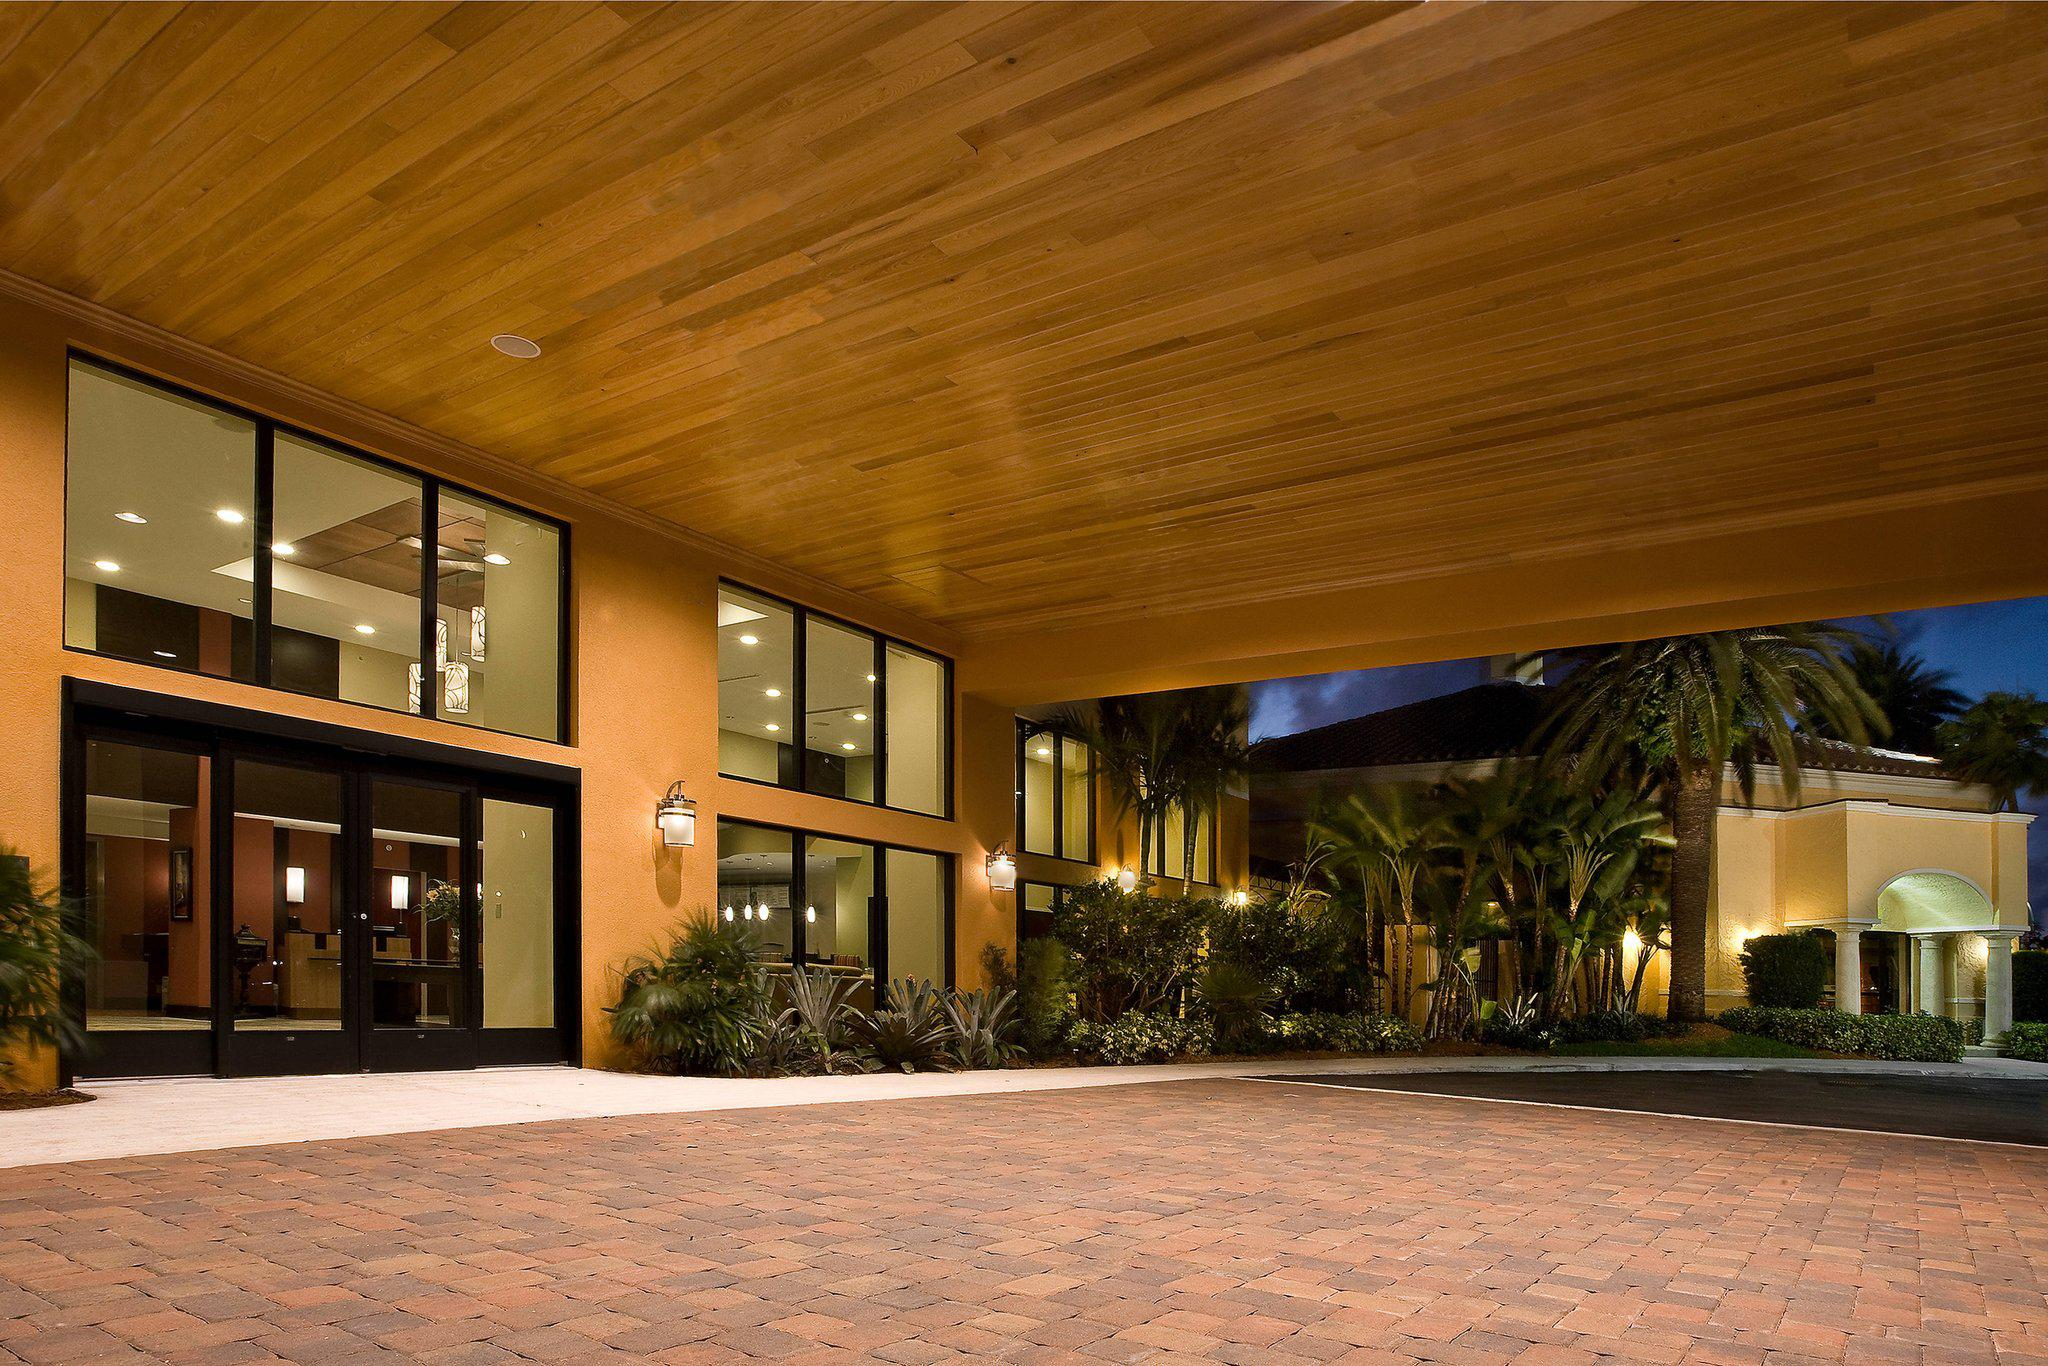 Courtyard by Marriott Boynton Beach